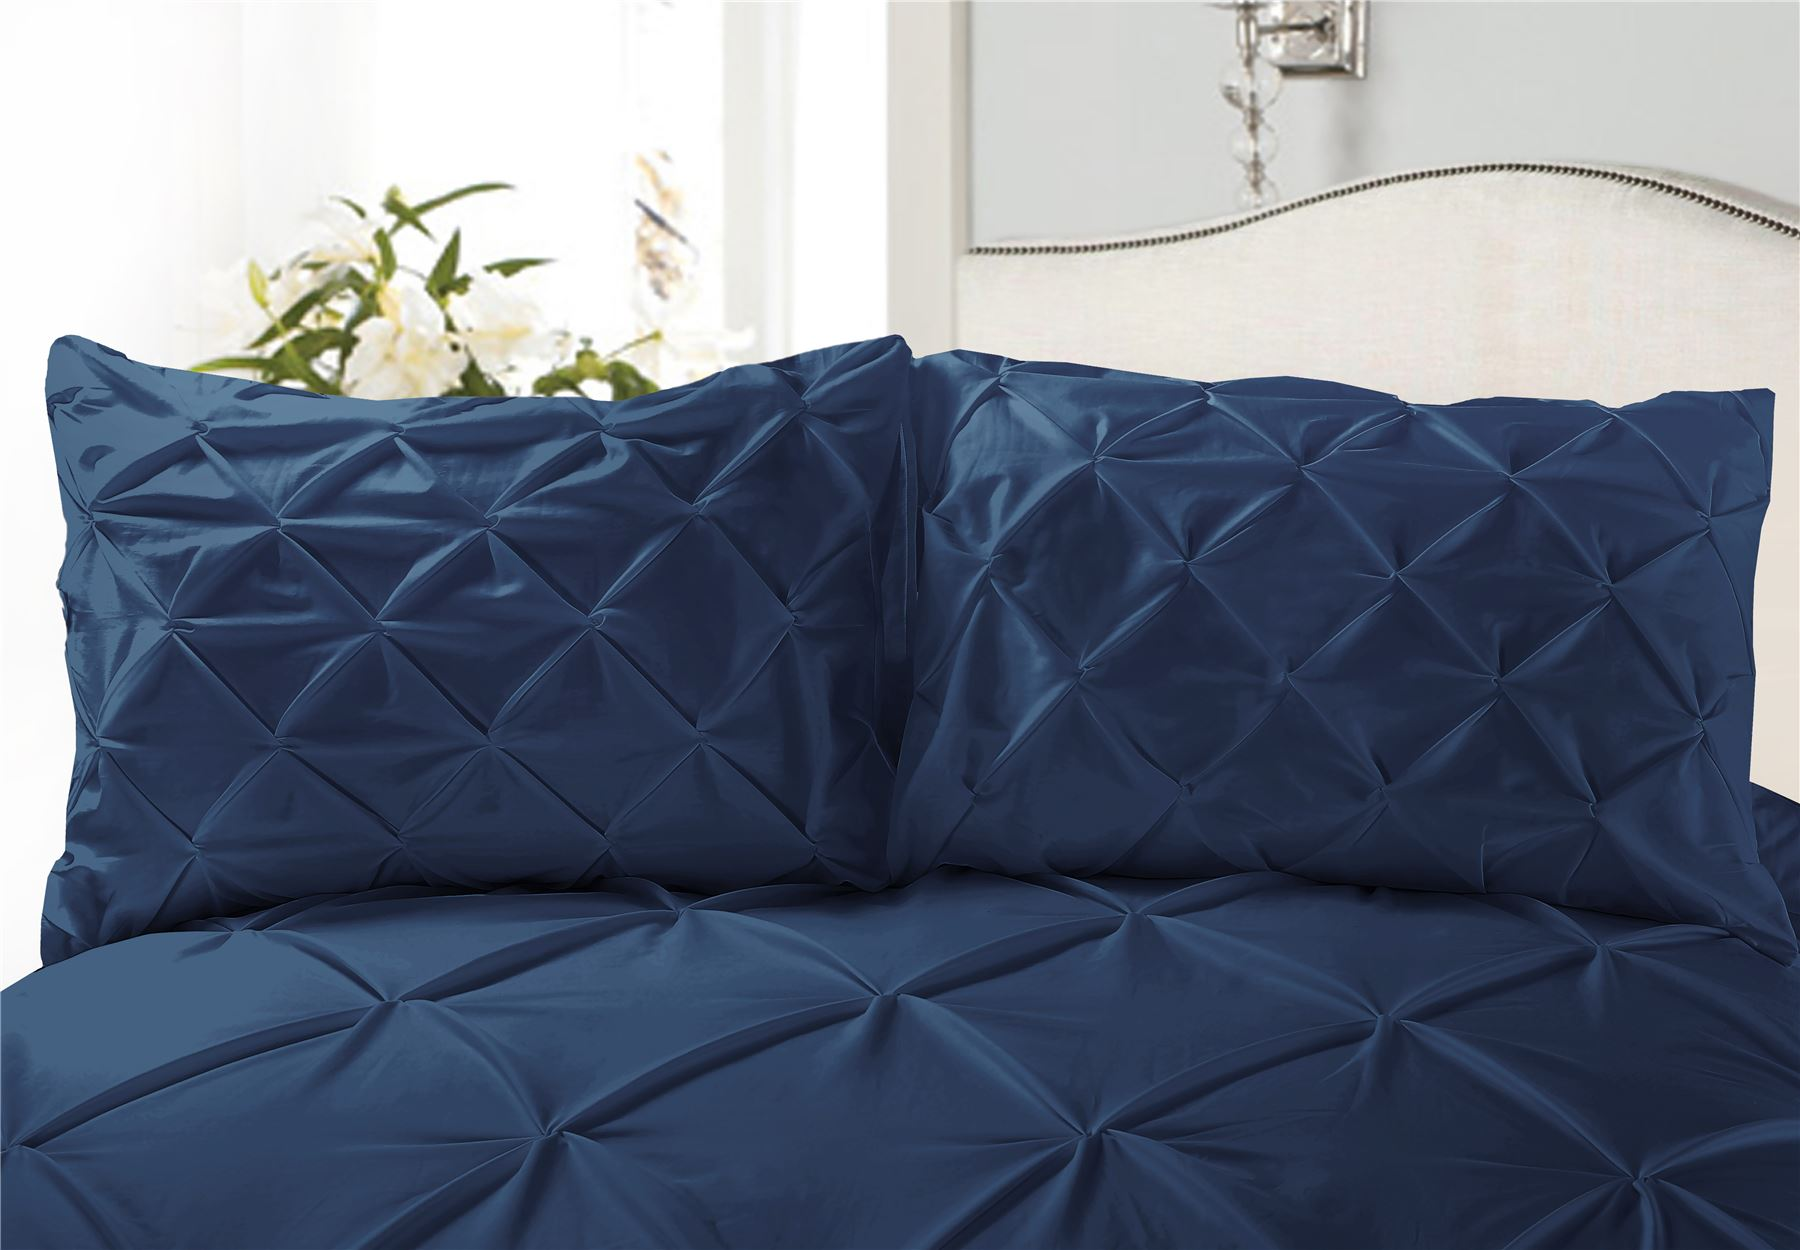 Luxury-Pure-100-Cotton-200-Thread-Pinch-Pleat-Pintuck-Puckering-Duvet-Cover-Set thumbnail 19